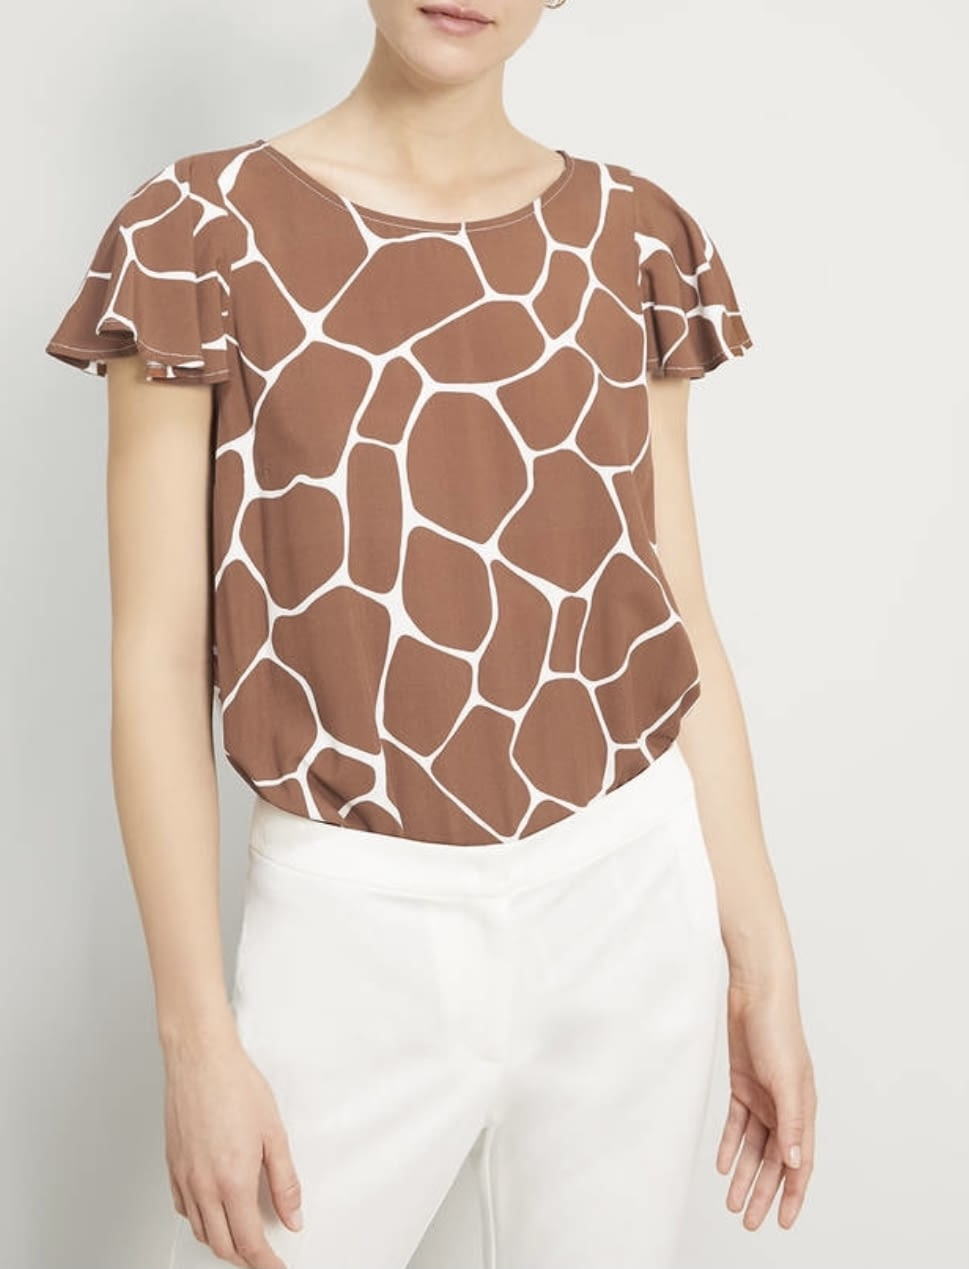 PENNYBLACK camisa sin manga estampado girafa